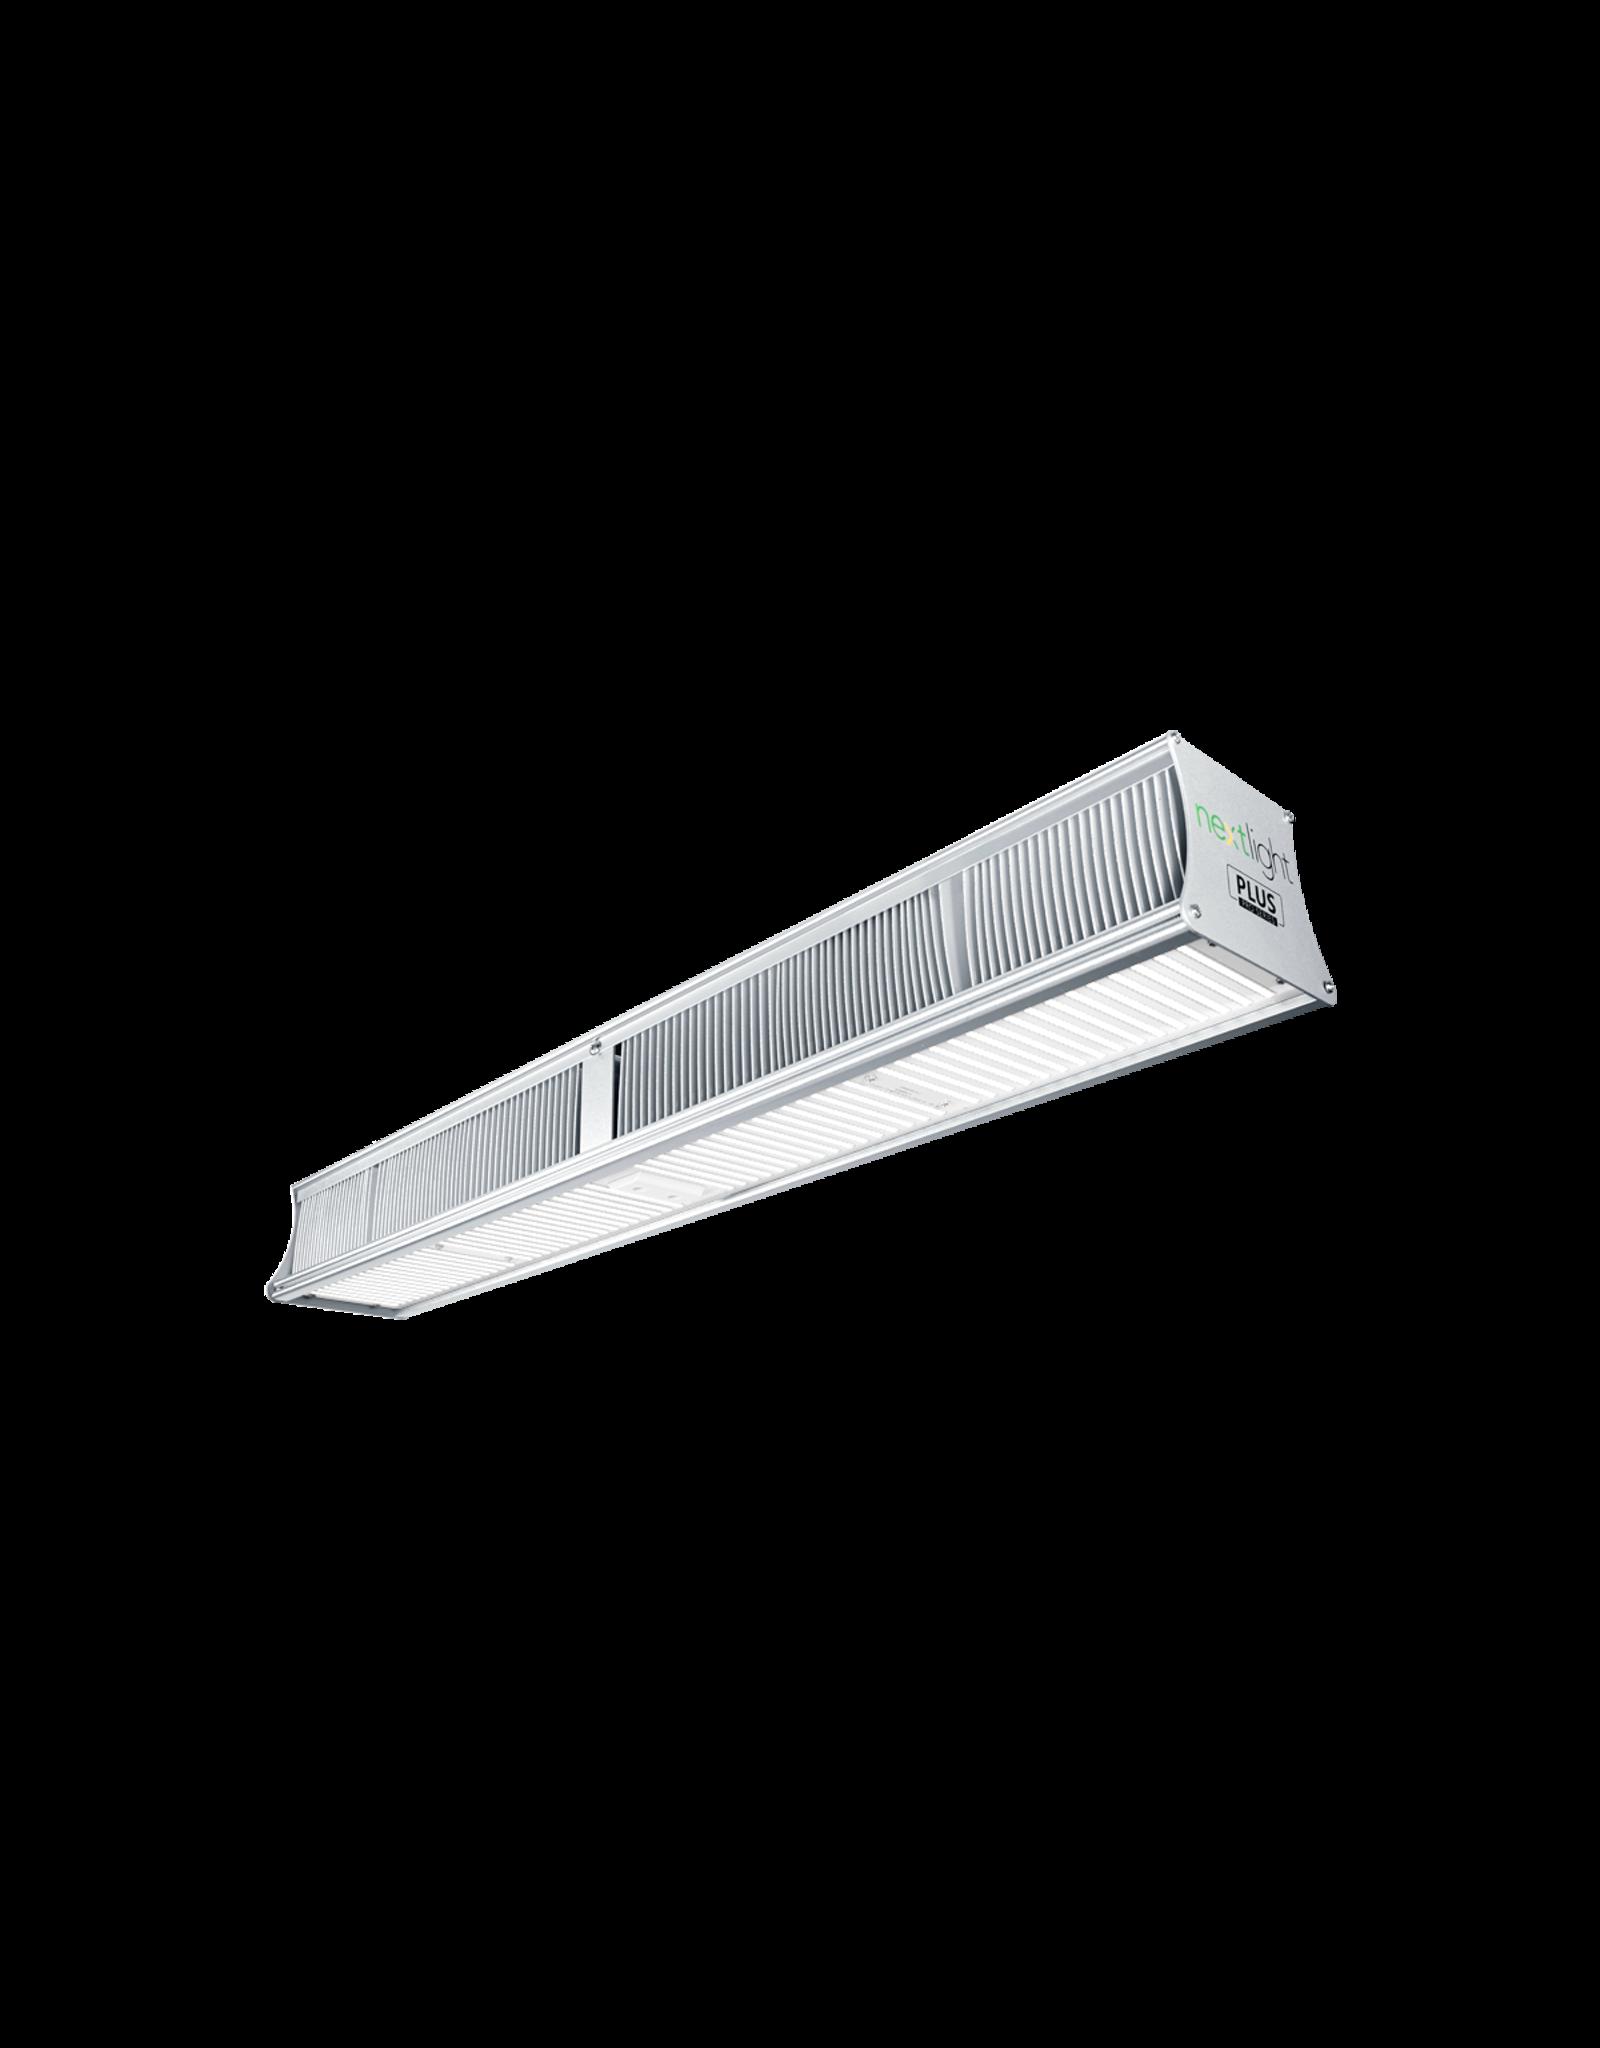 NextLight NextLight Plus Pro - 320W LED Grow Light